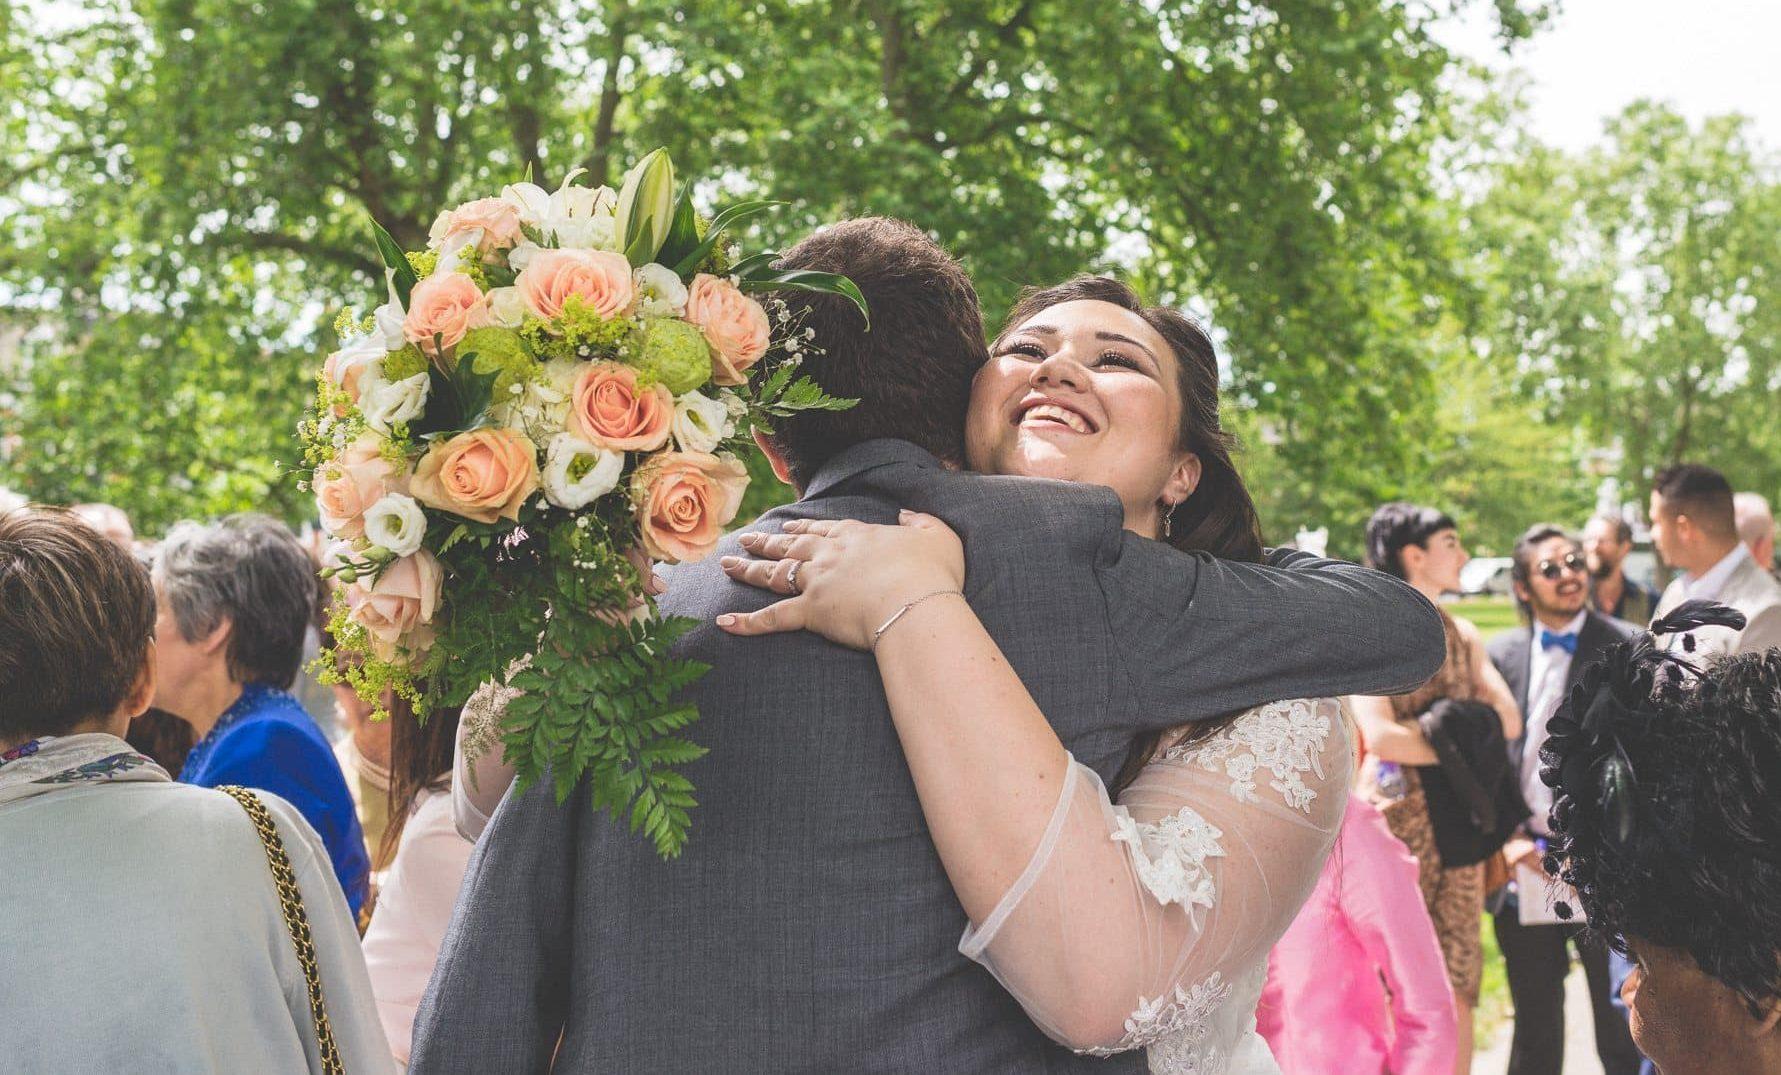 Thai Bride hugging a wedding guest